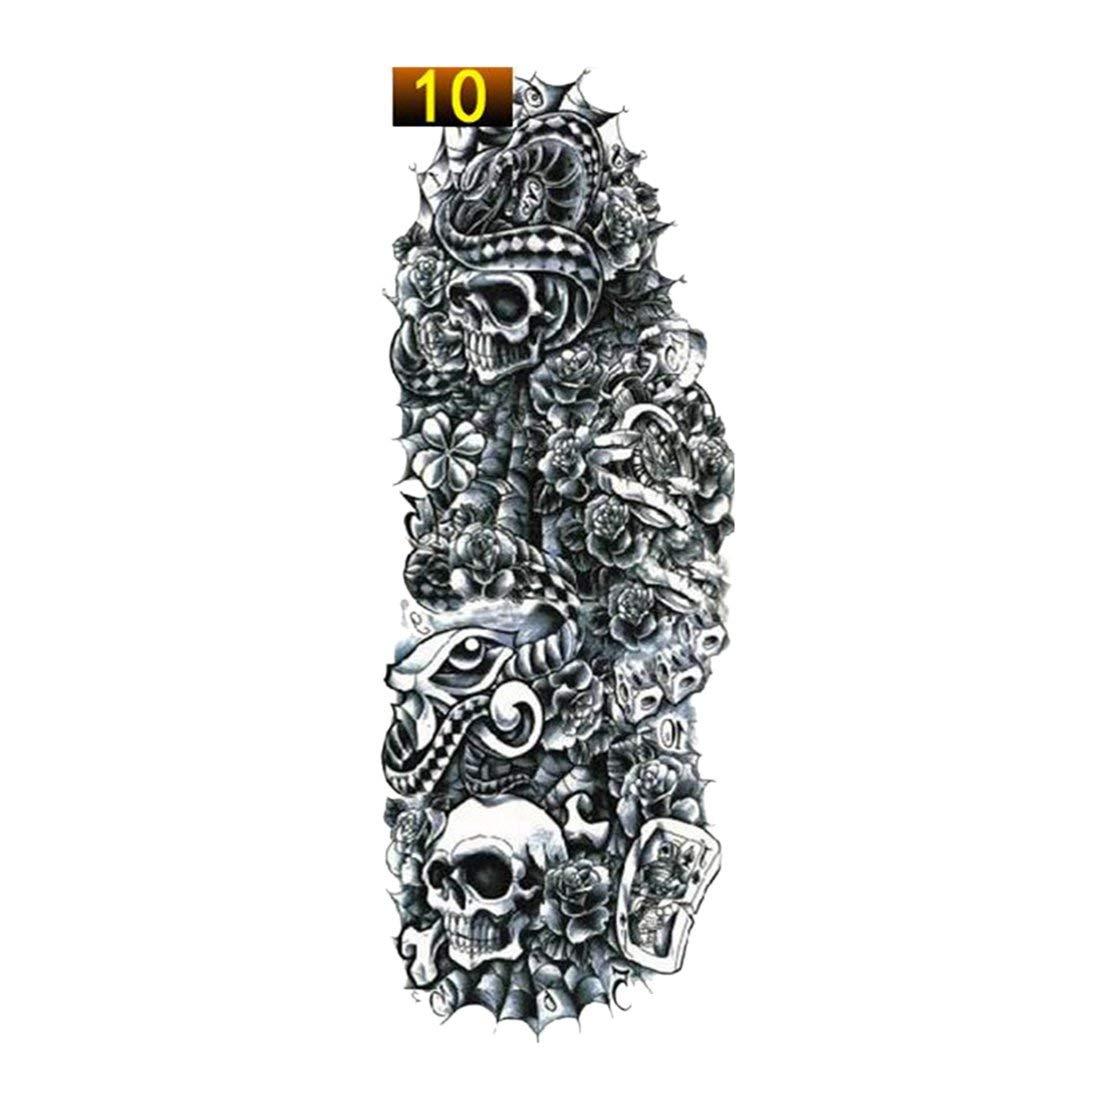 Sanzhileg 1 UNIDS Etiqueta Engomada del Tatuaje del Brazo Completo Impermeable Tatuaje Temporal Manga Hombres Mujeres Pintura Corporal Transferencia de Agua Fake Tatoo Manga